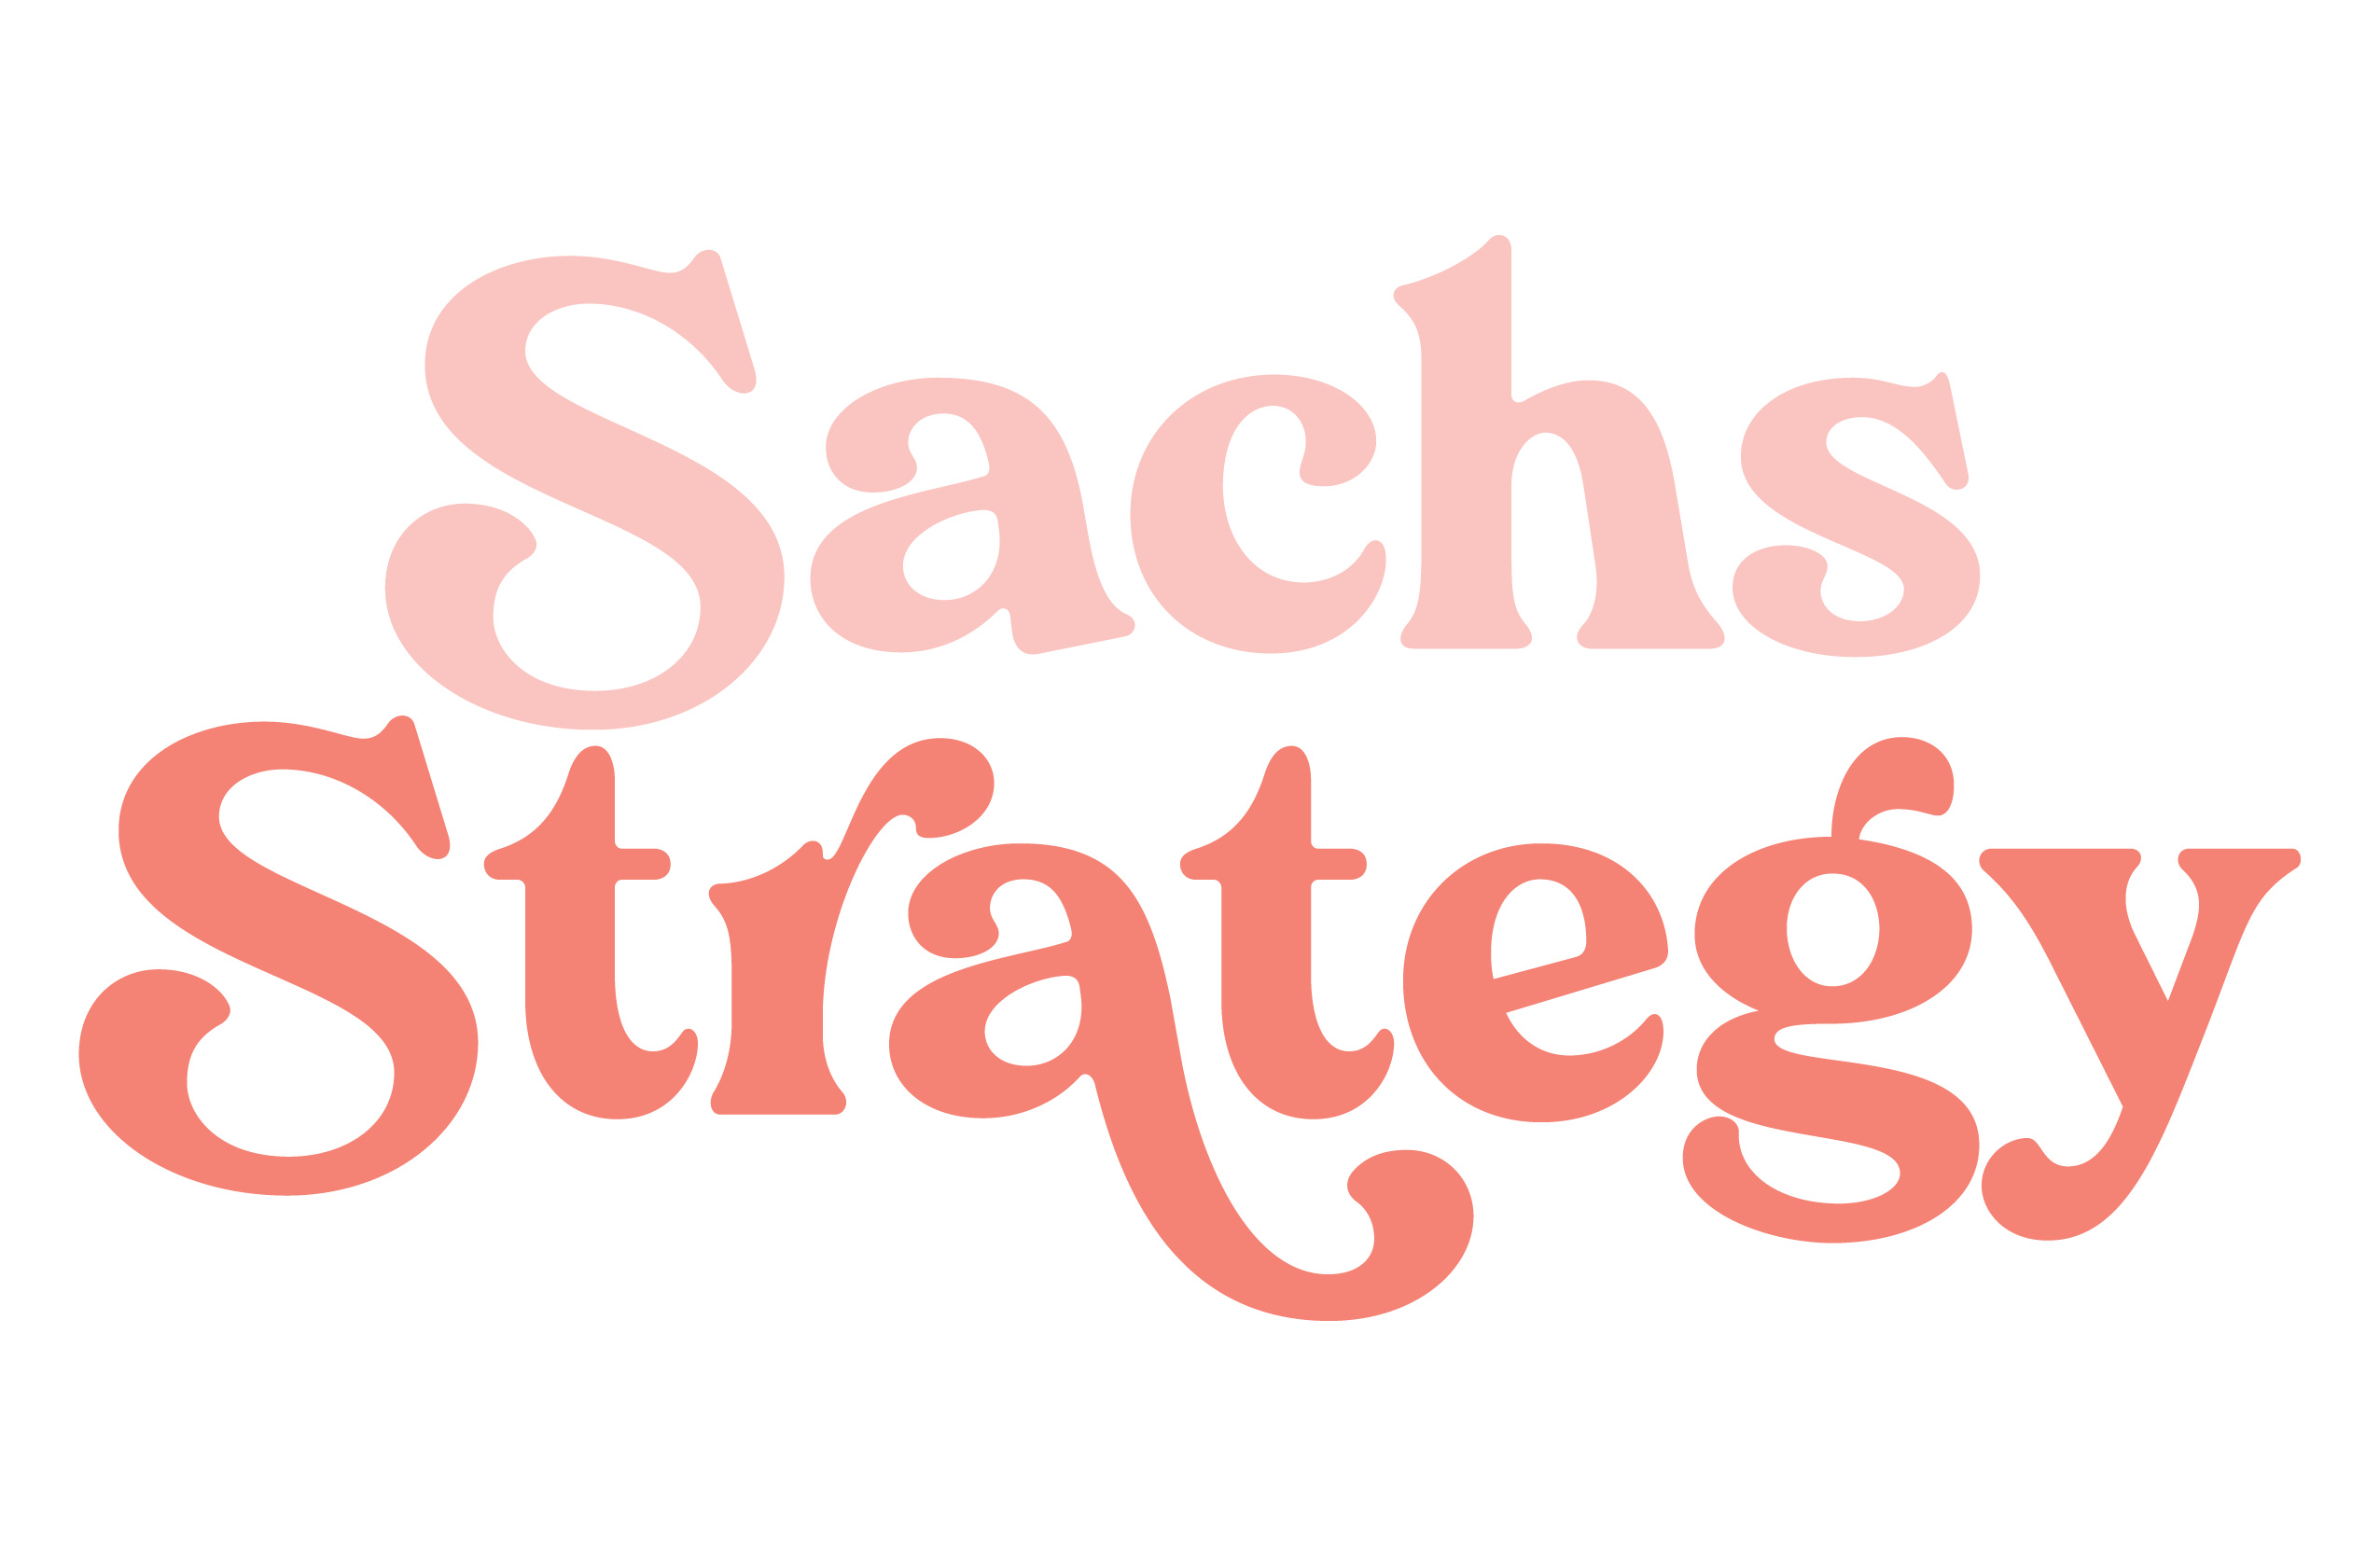 Sachs Strategy